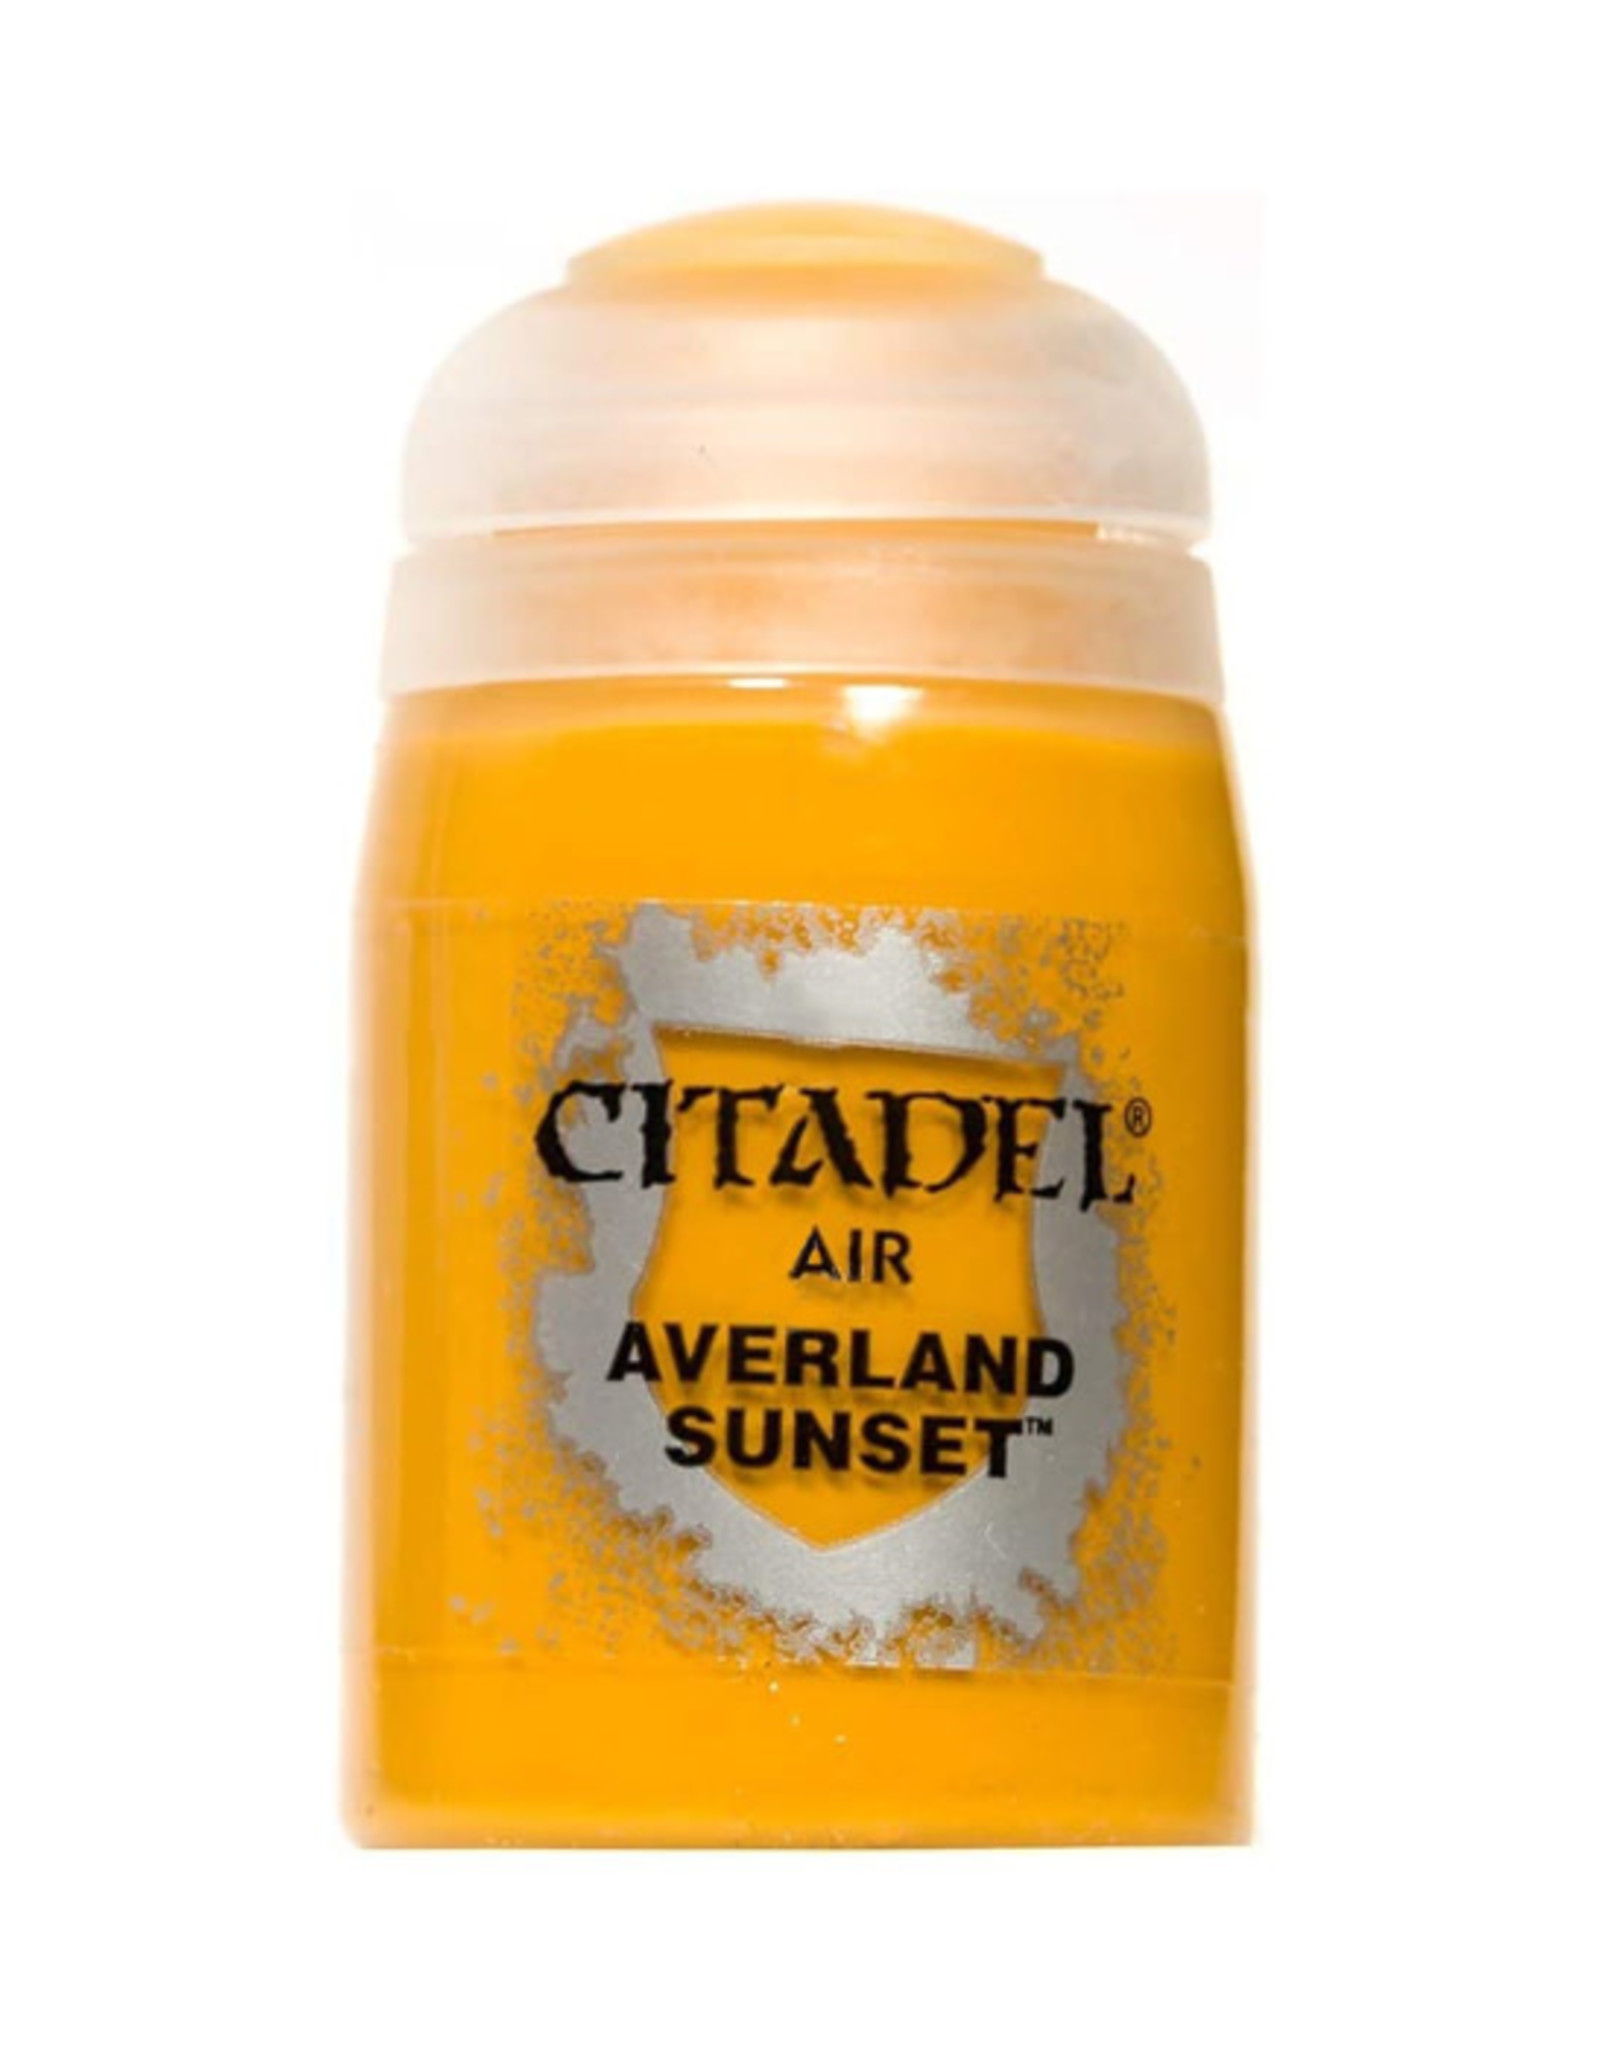 Chessex Citadel Colour: Air - Averland Sunset